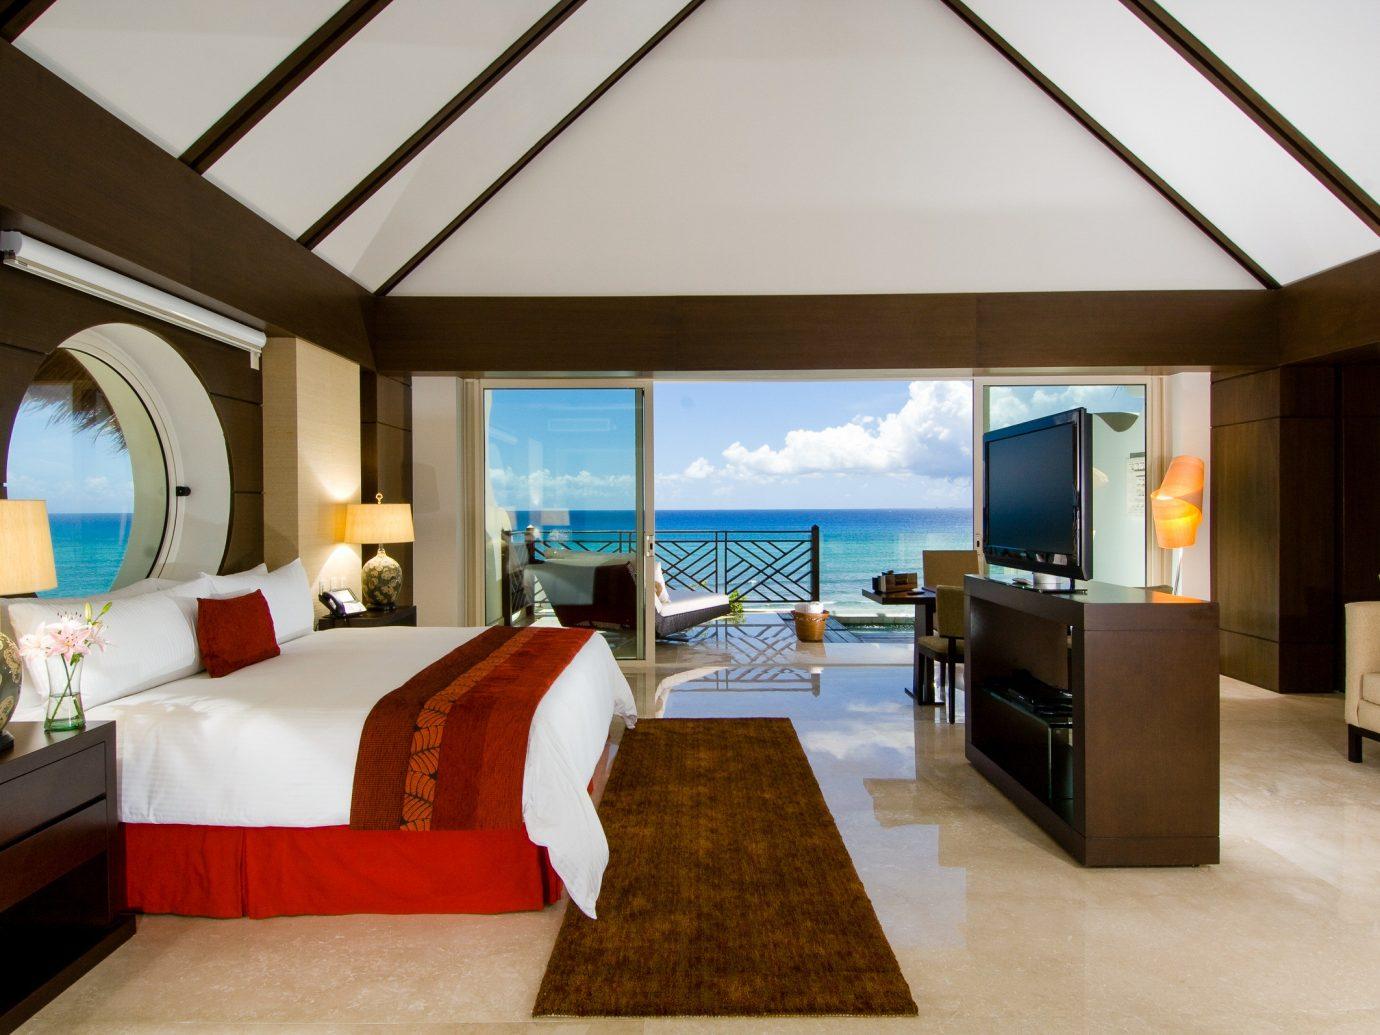 Bedroom at Grand Velas Riviera Maya